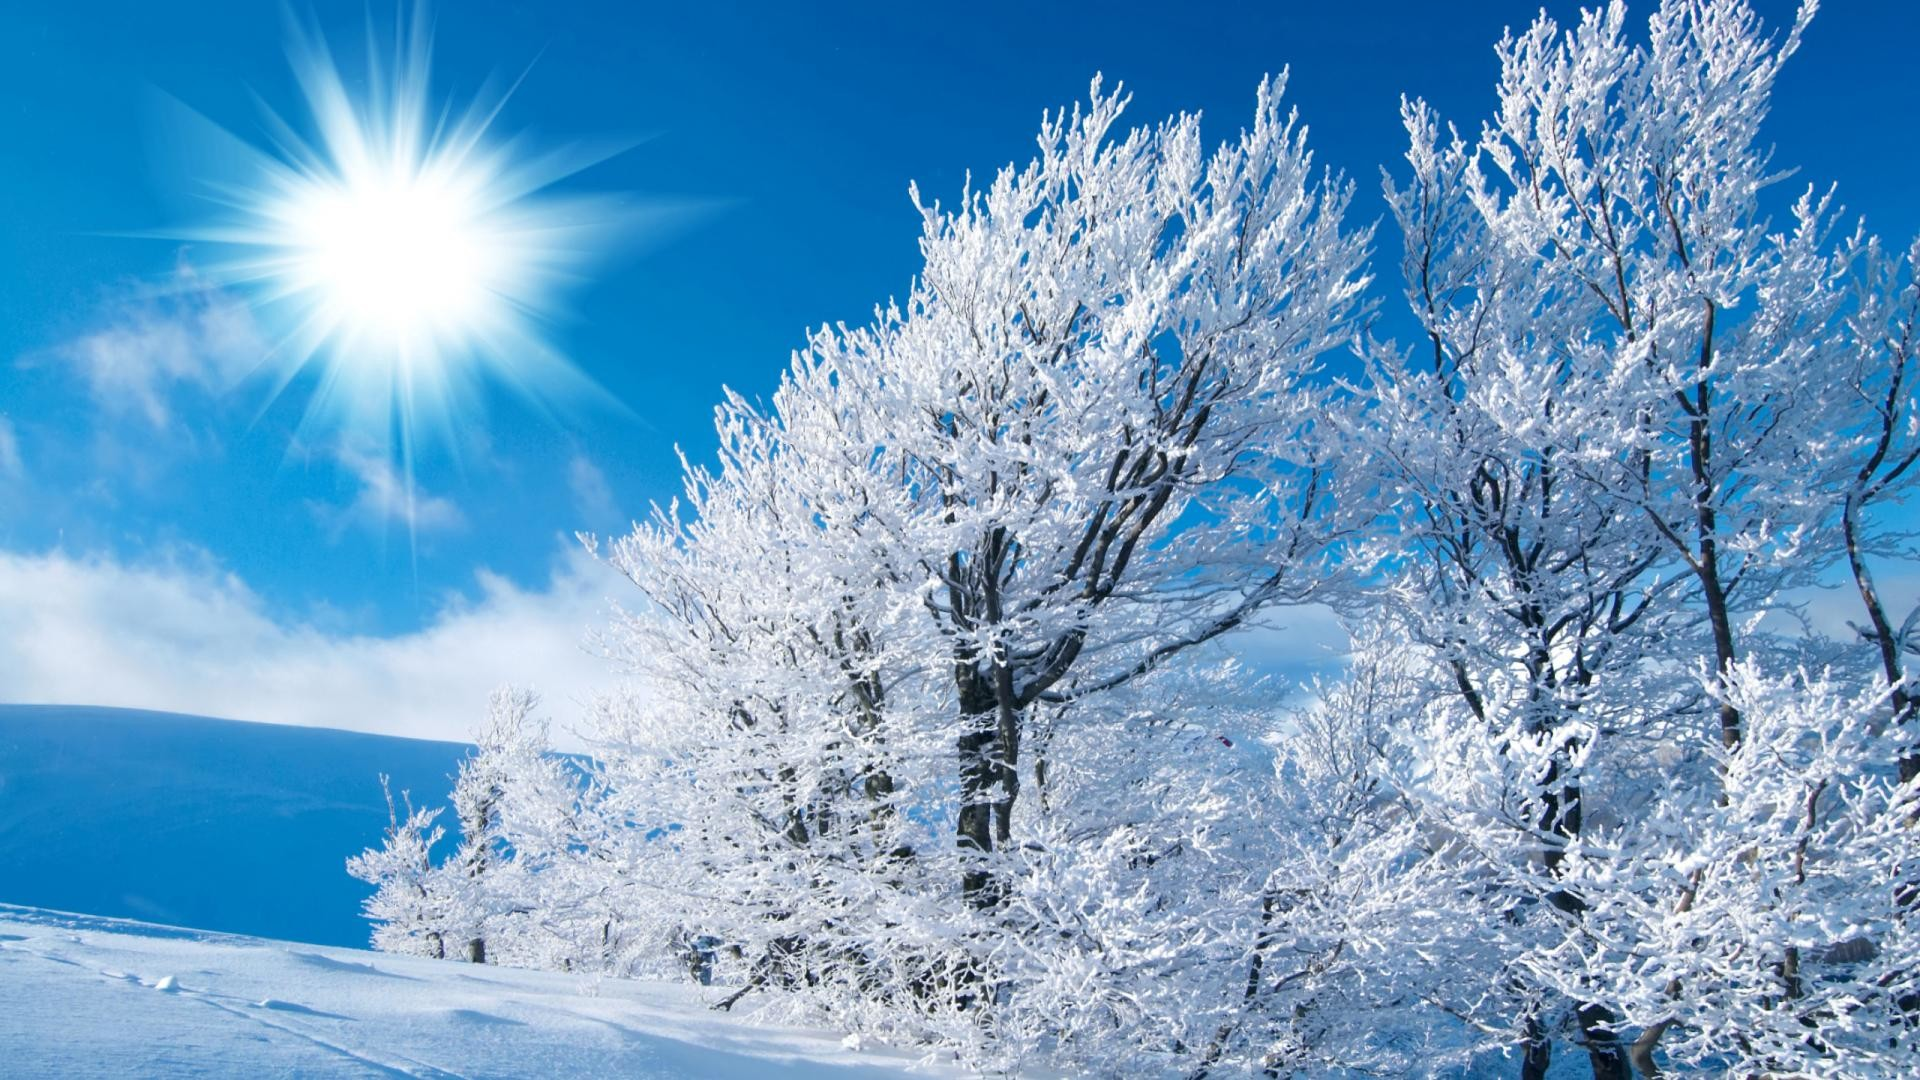 Desktop Wallpapers and Backgrounds   Winter, backgrounds, desktop, wallpaper  – 735248